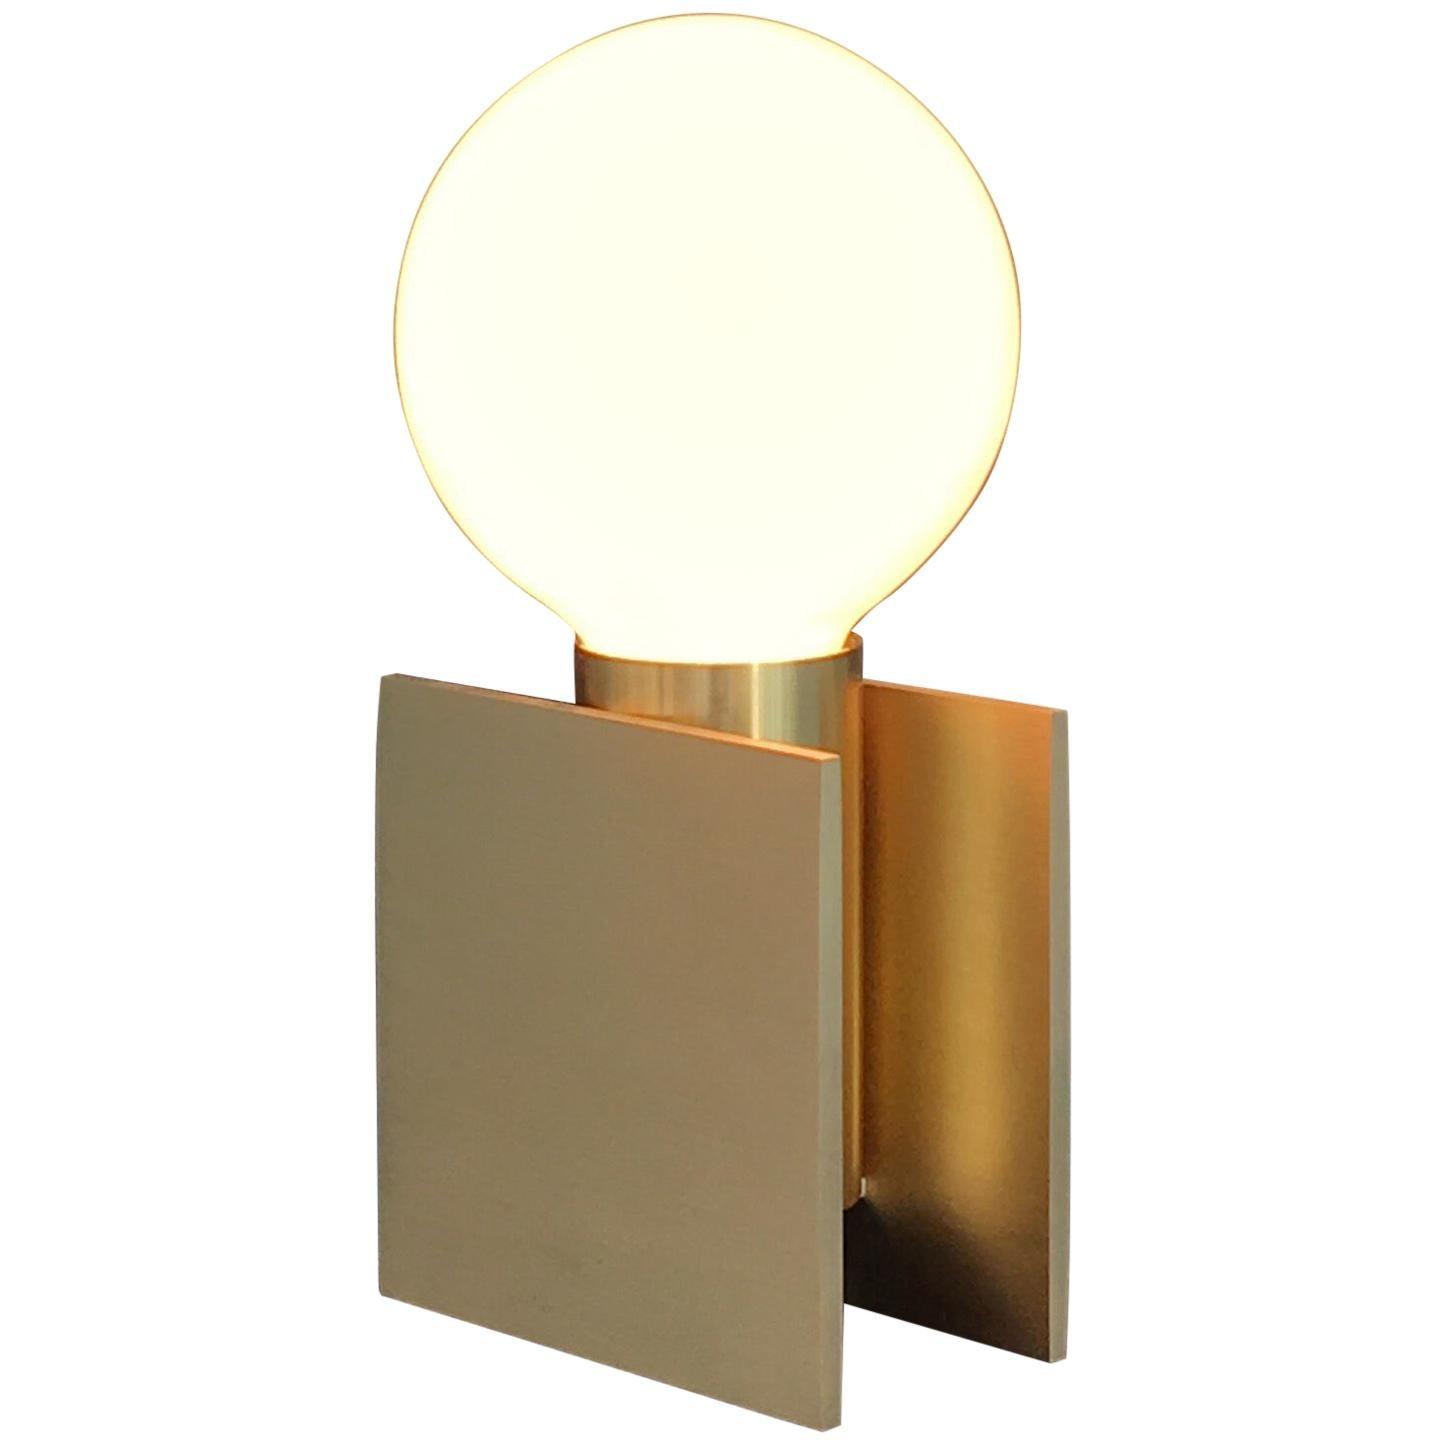 IOI Lamp by SB26